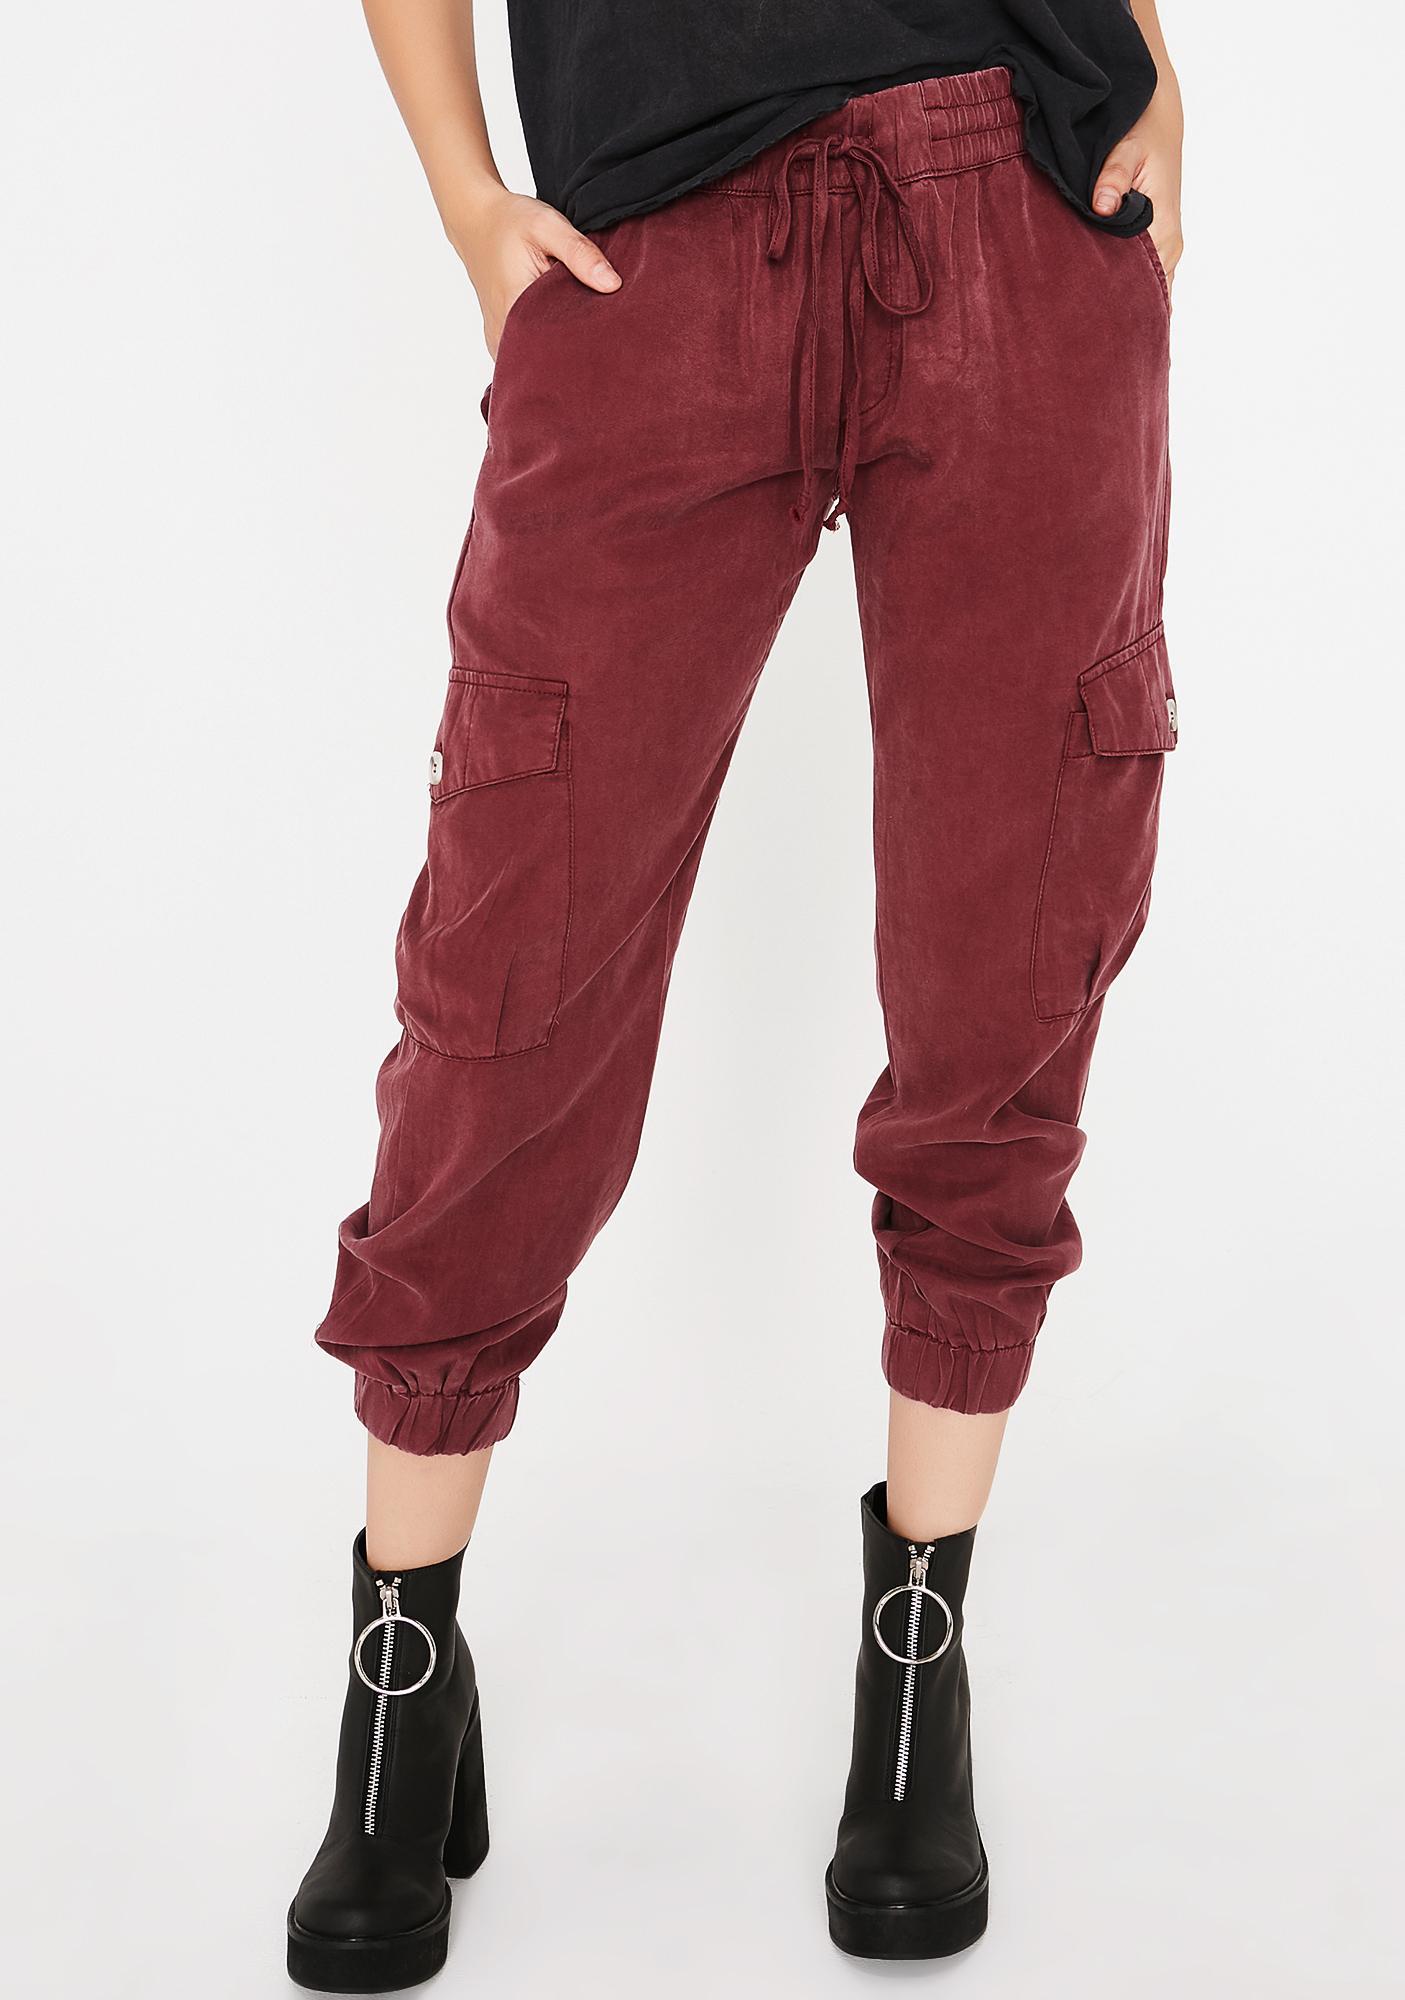 Slacker Chic Cargo Pants